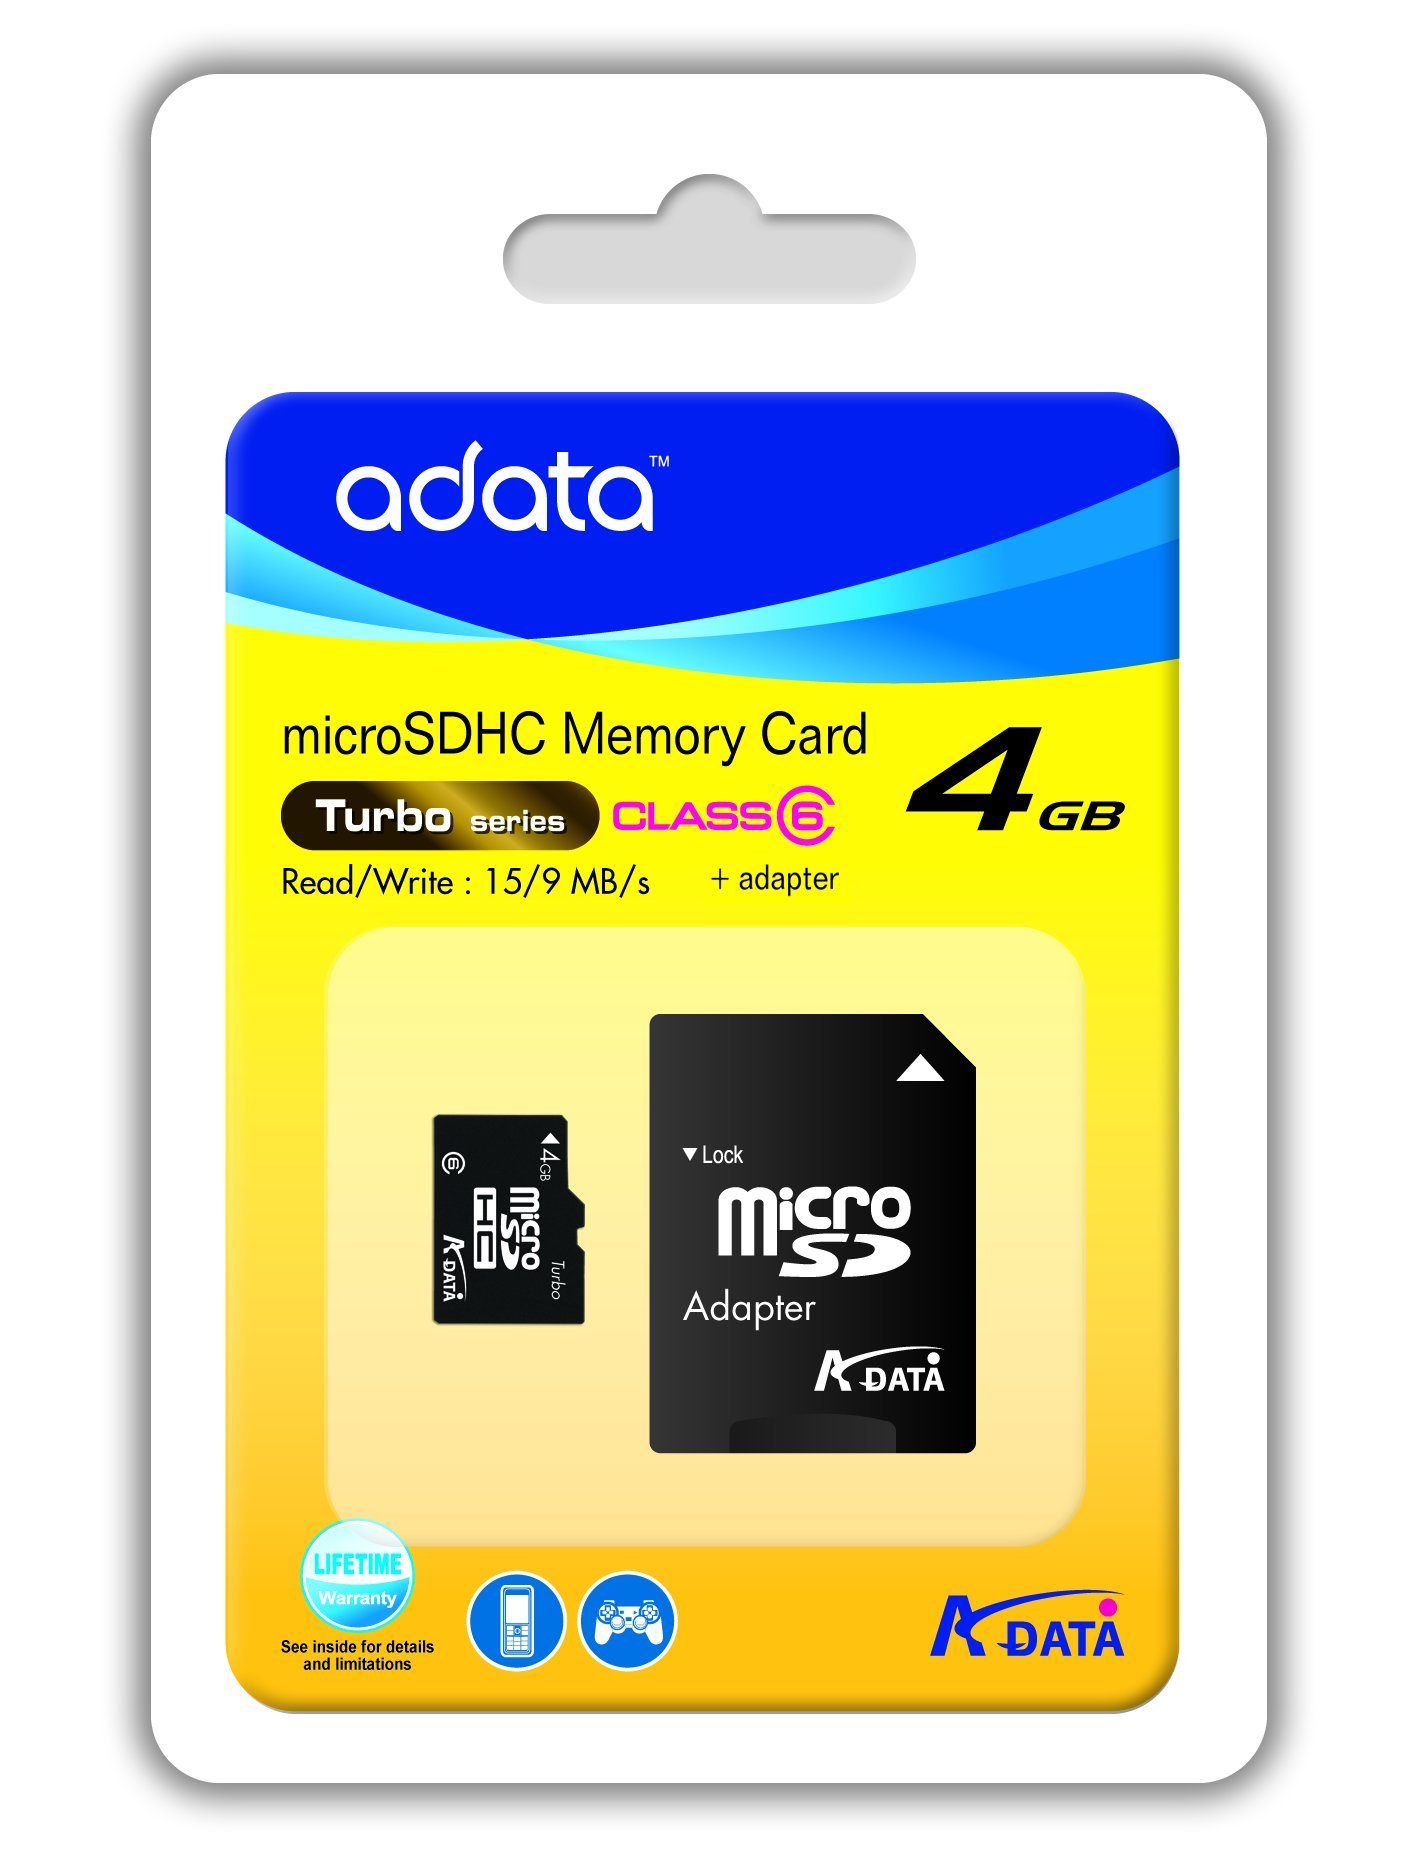 ADATA 4 GB Class 6 microSDHC Flash Memory Card 4GUSDHC6